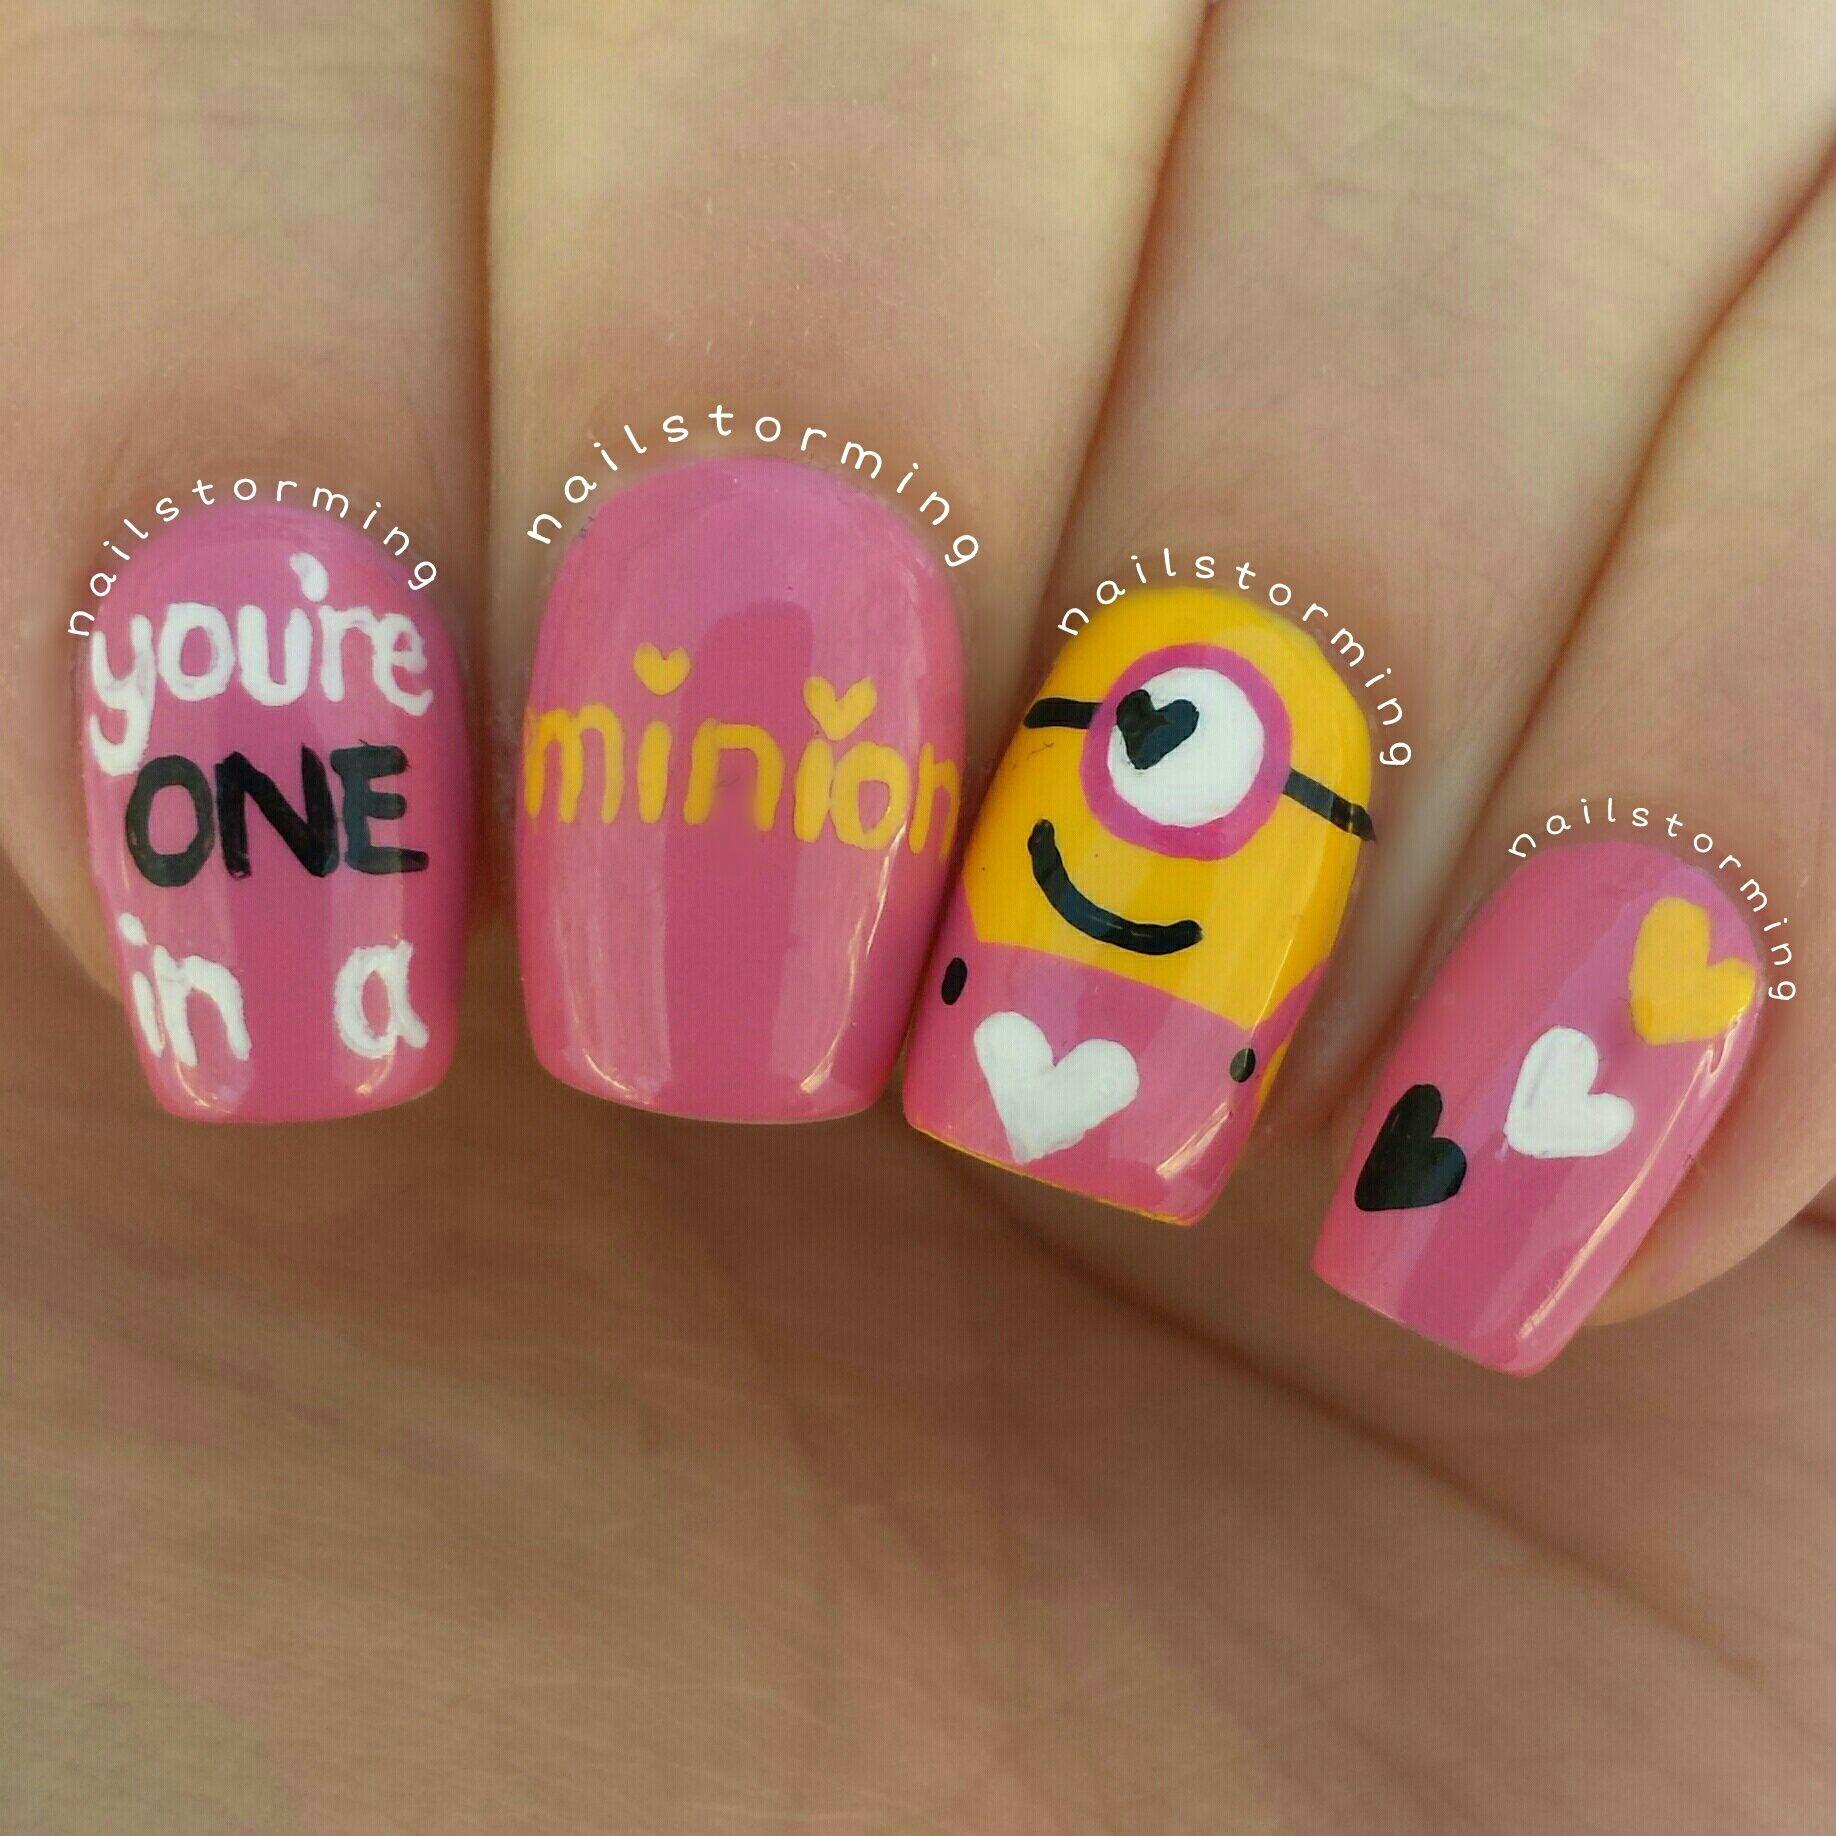 minion valentine nails | Things I love | Pinterest | Minion ...